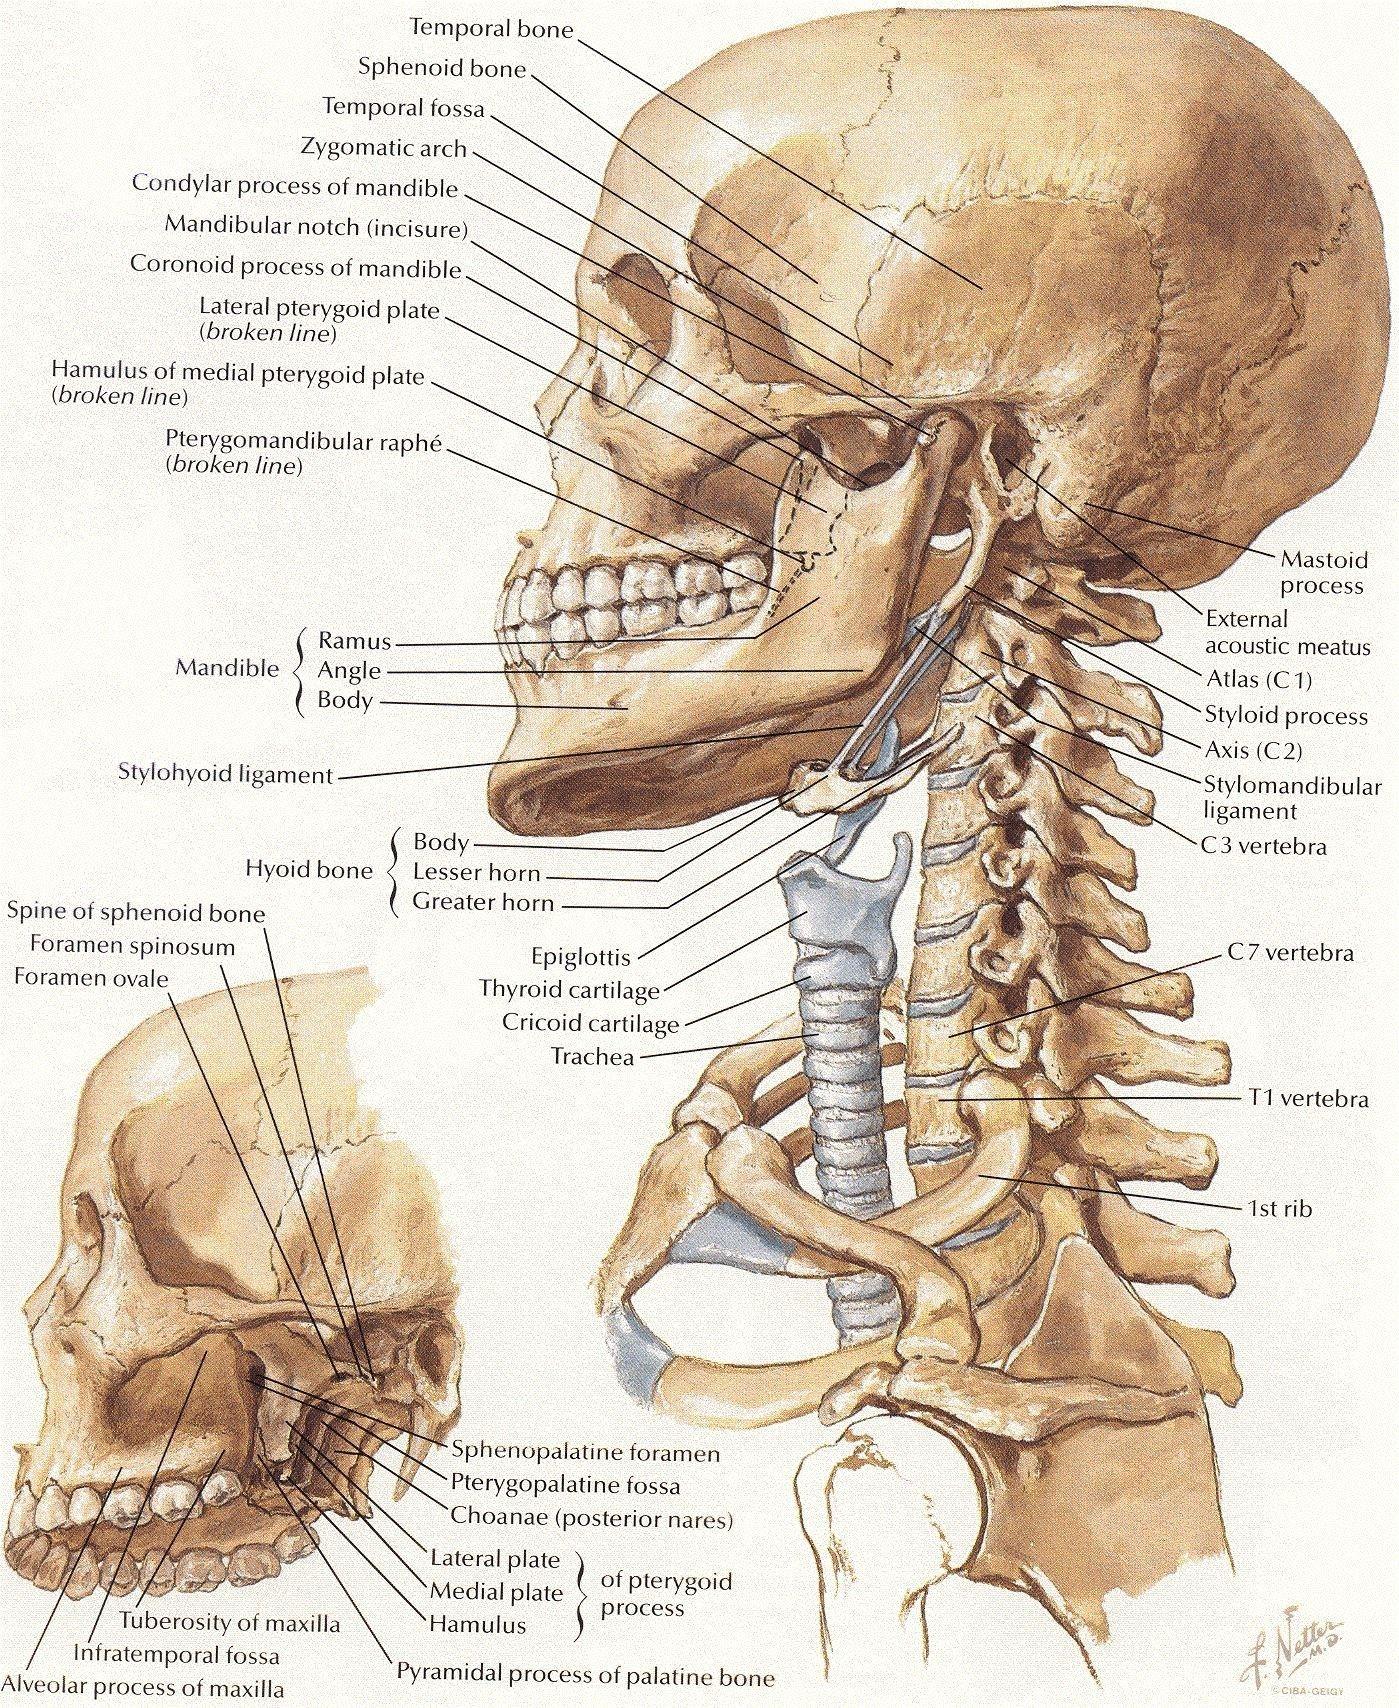 mastoid bone picture mastoid bone picture netter 009 head neck bones medical pinterest [ 1399 x 1708 Pixel ]